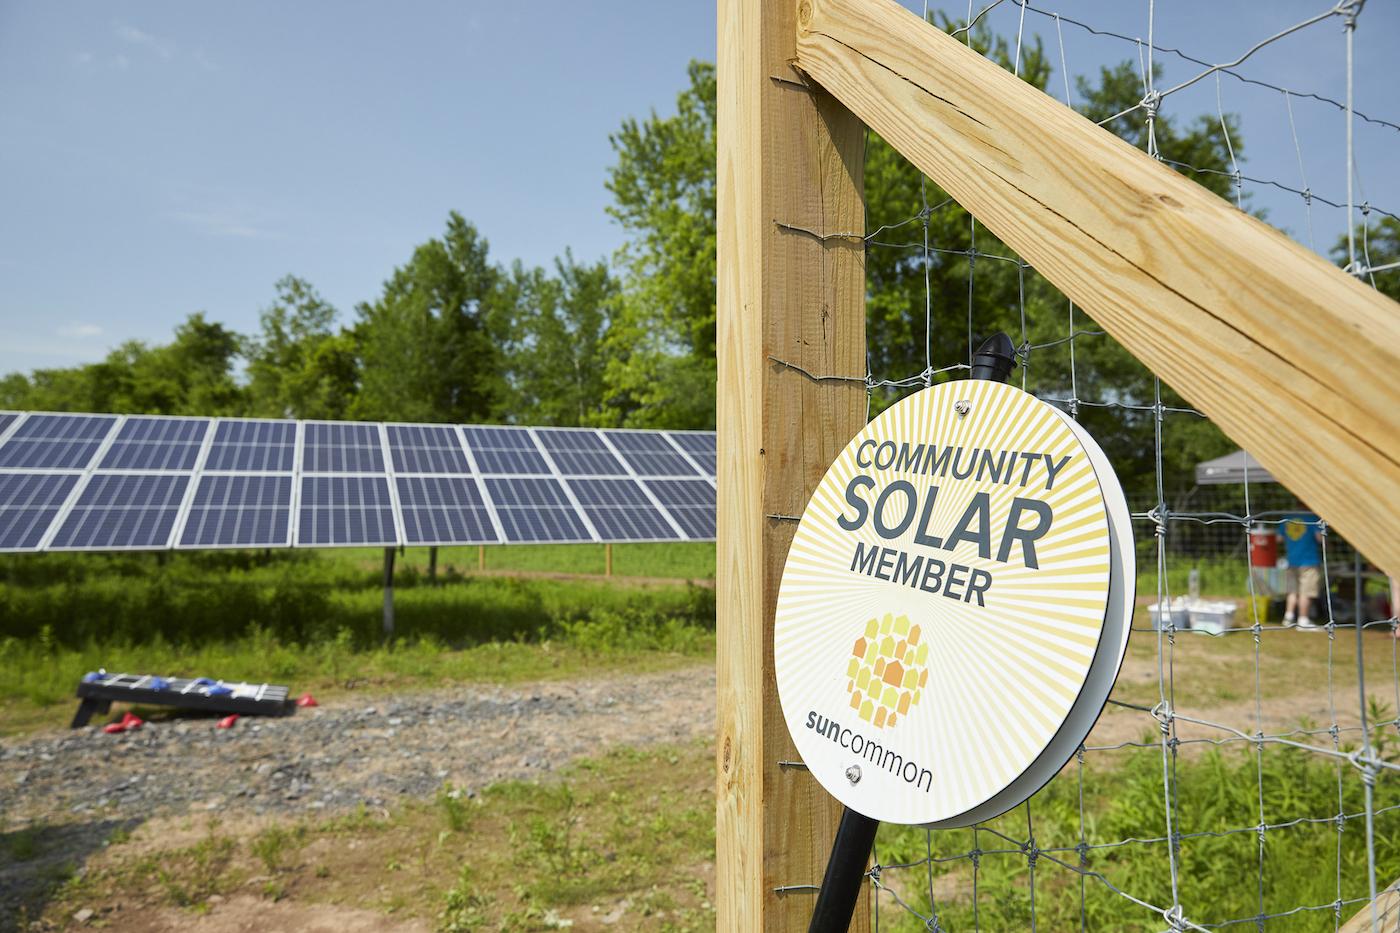 Pointe of Praise Community Solar Array